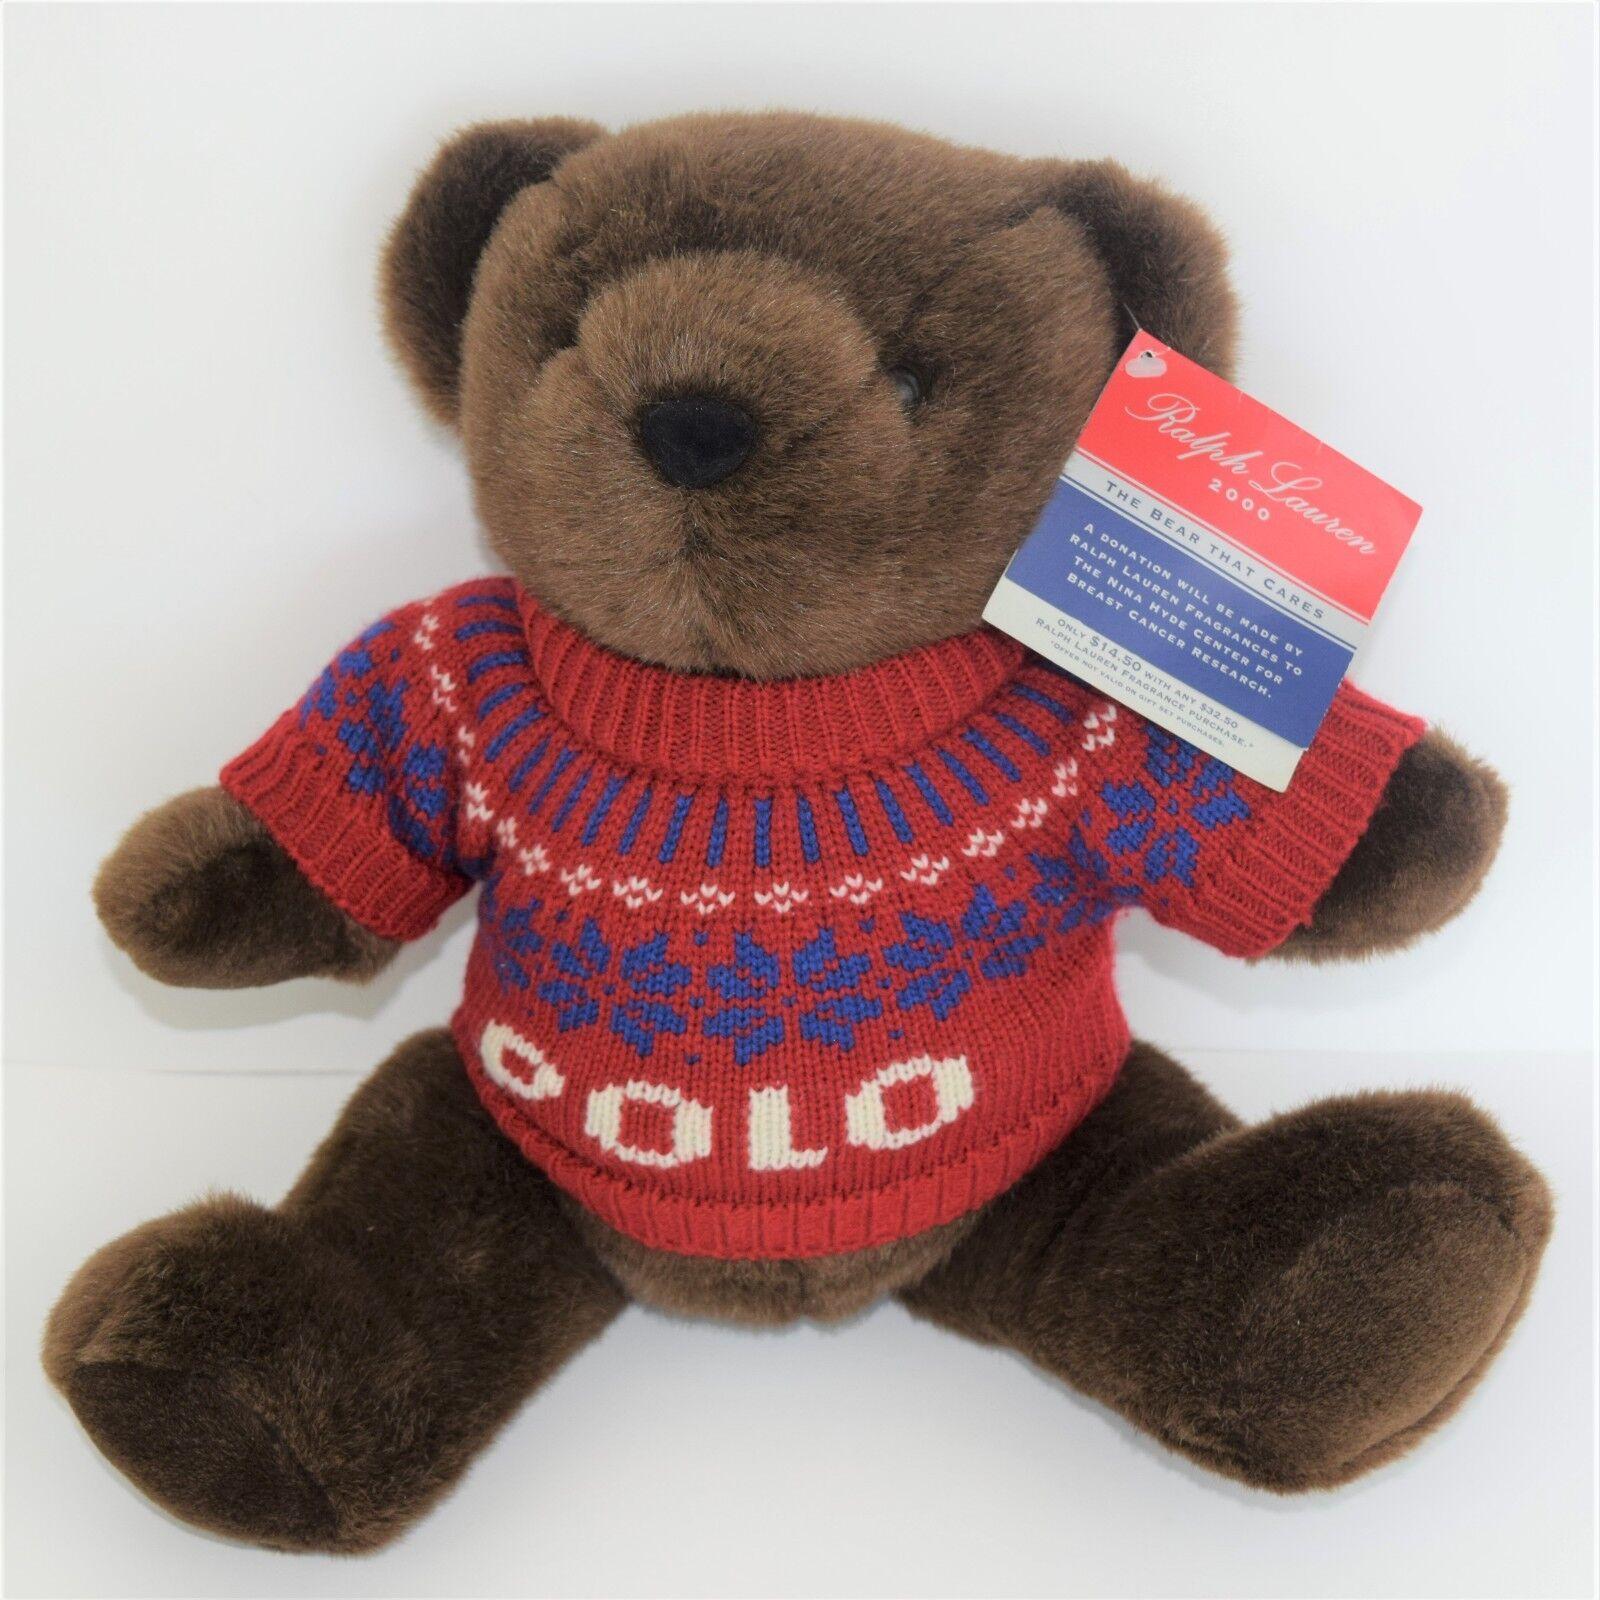 Ralph LAUREN POLO Teddy Bear rot SNOWFLAKE Ski Sweater 2000 Millennial PLUSH